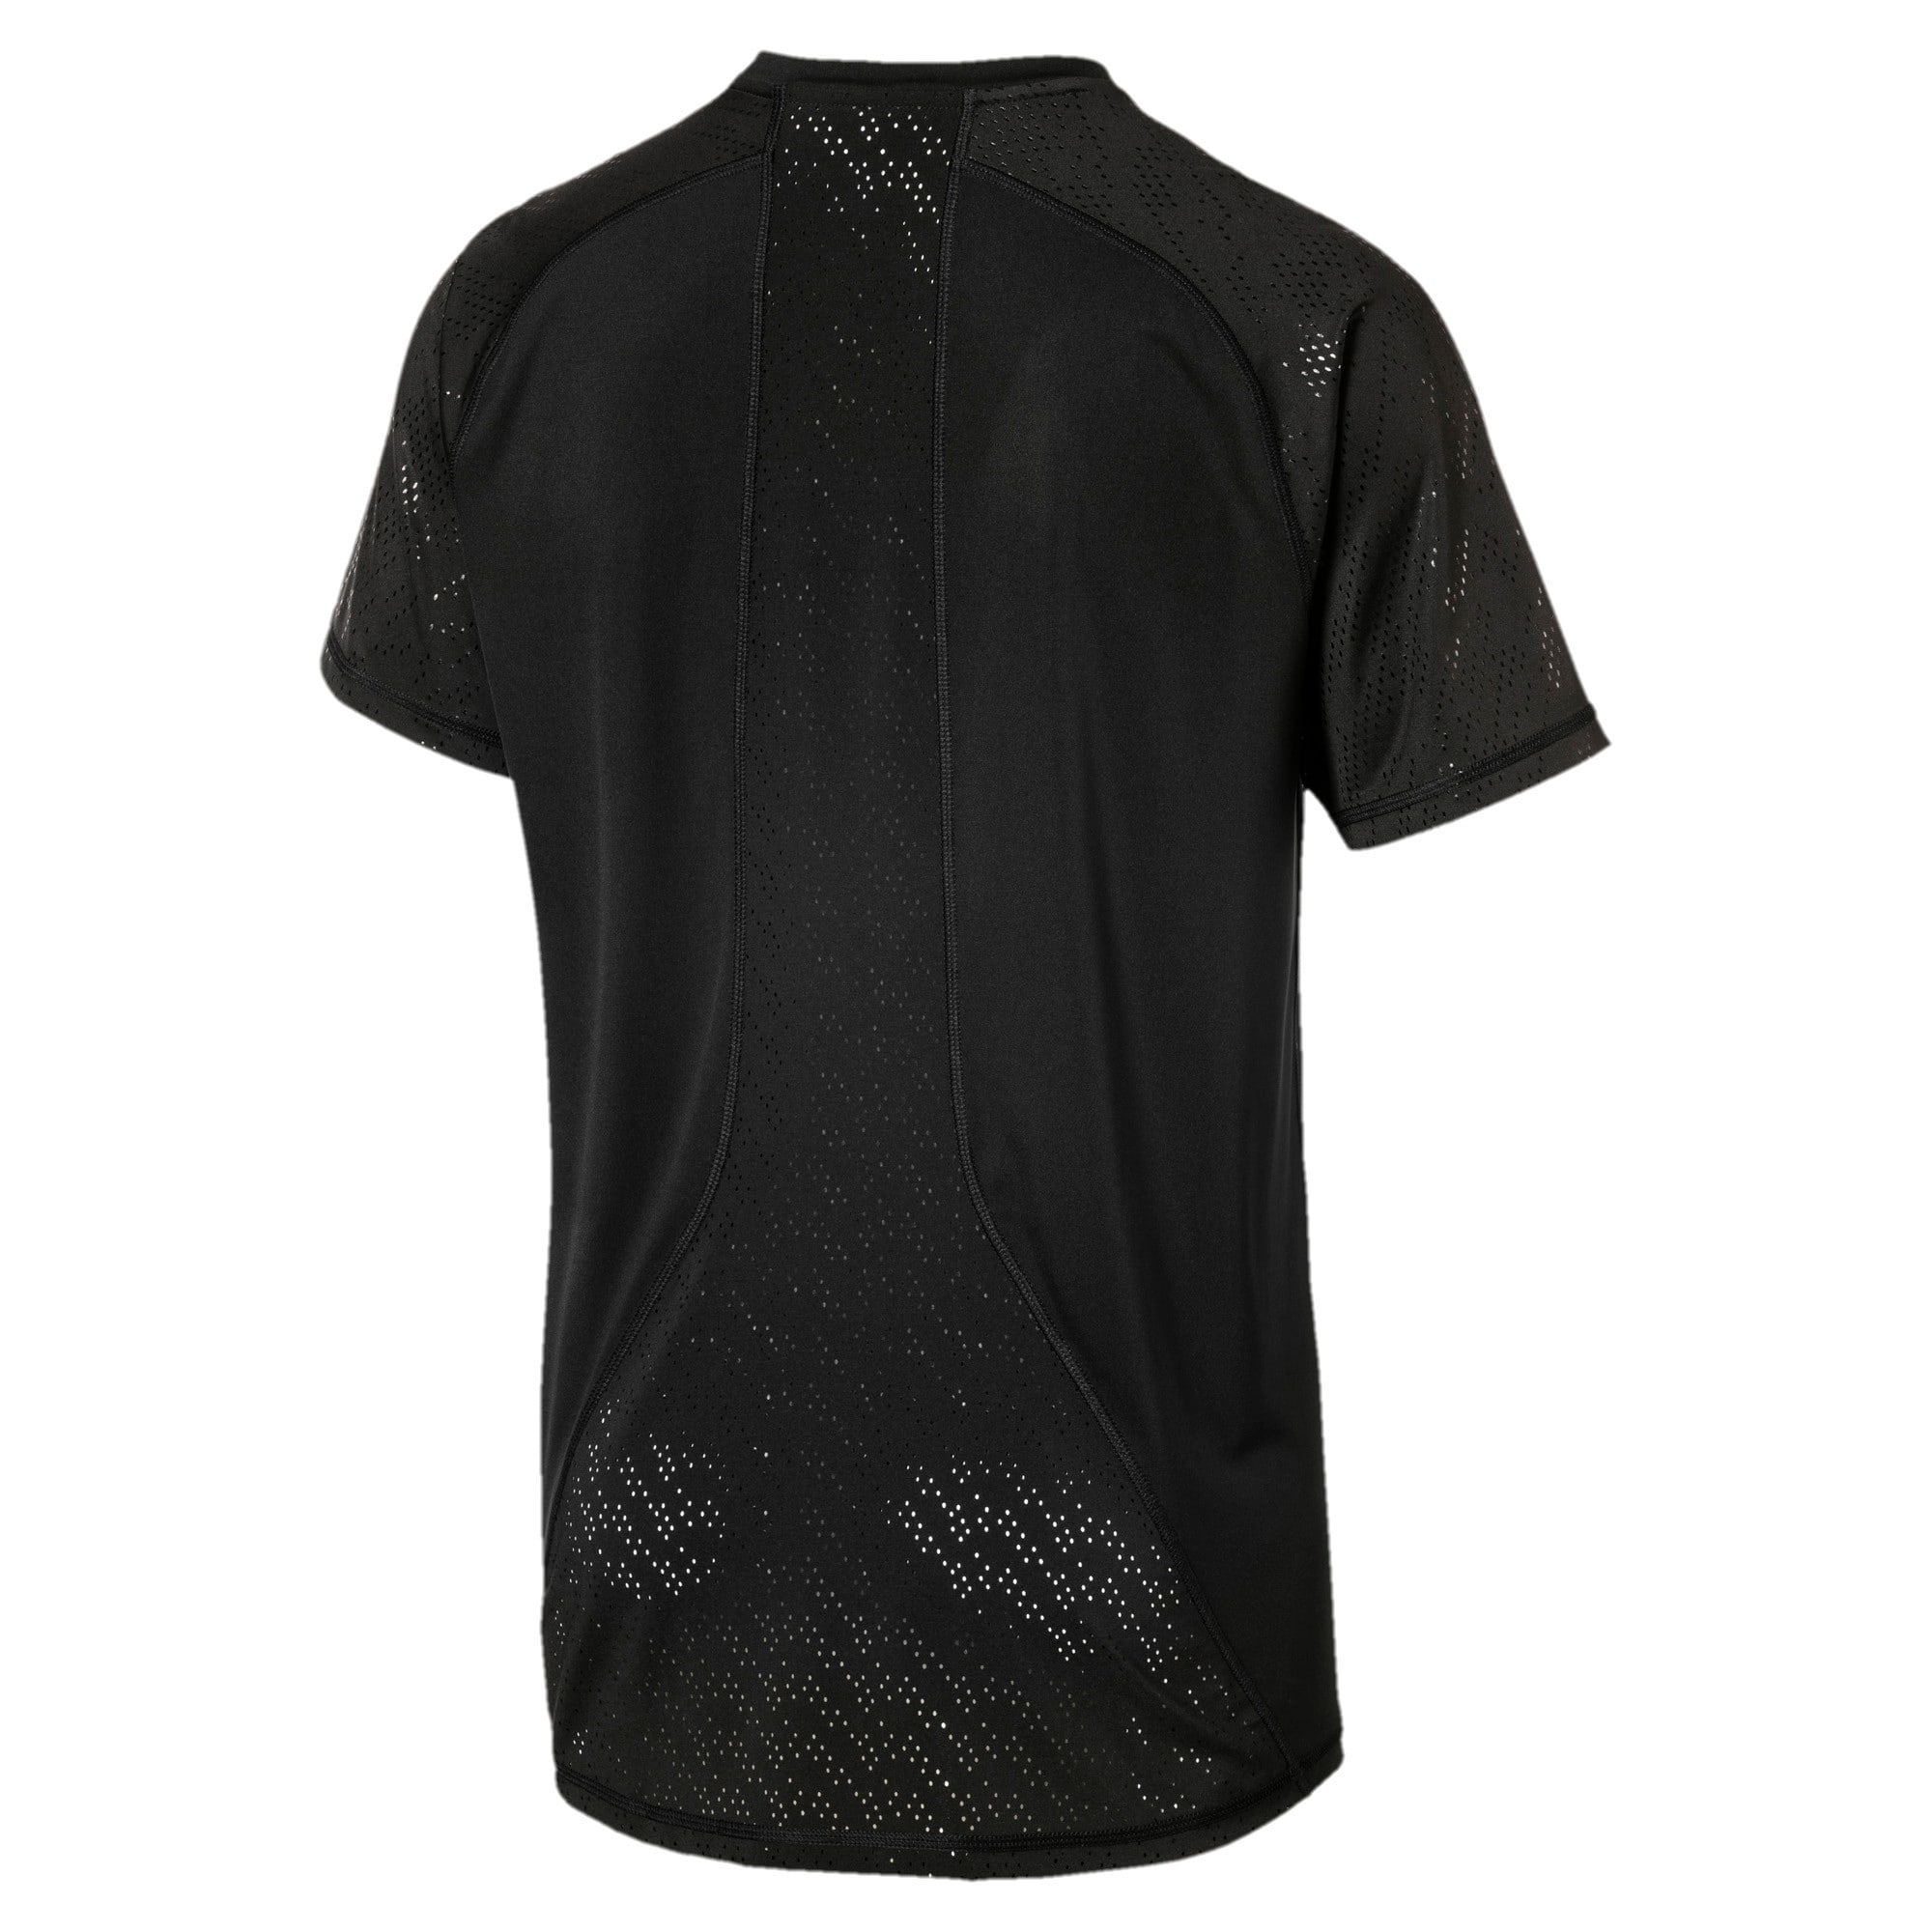 Thumbnail 4 of Active Training Men's Vent T-Shirt, Puma Black, medium-IND